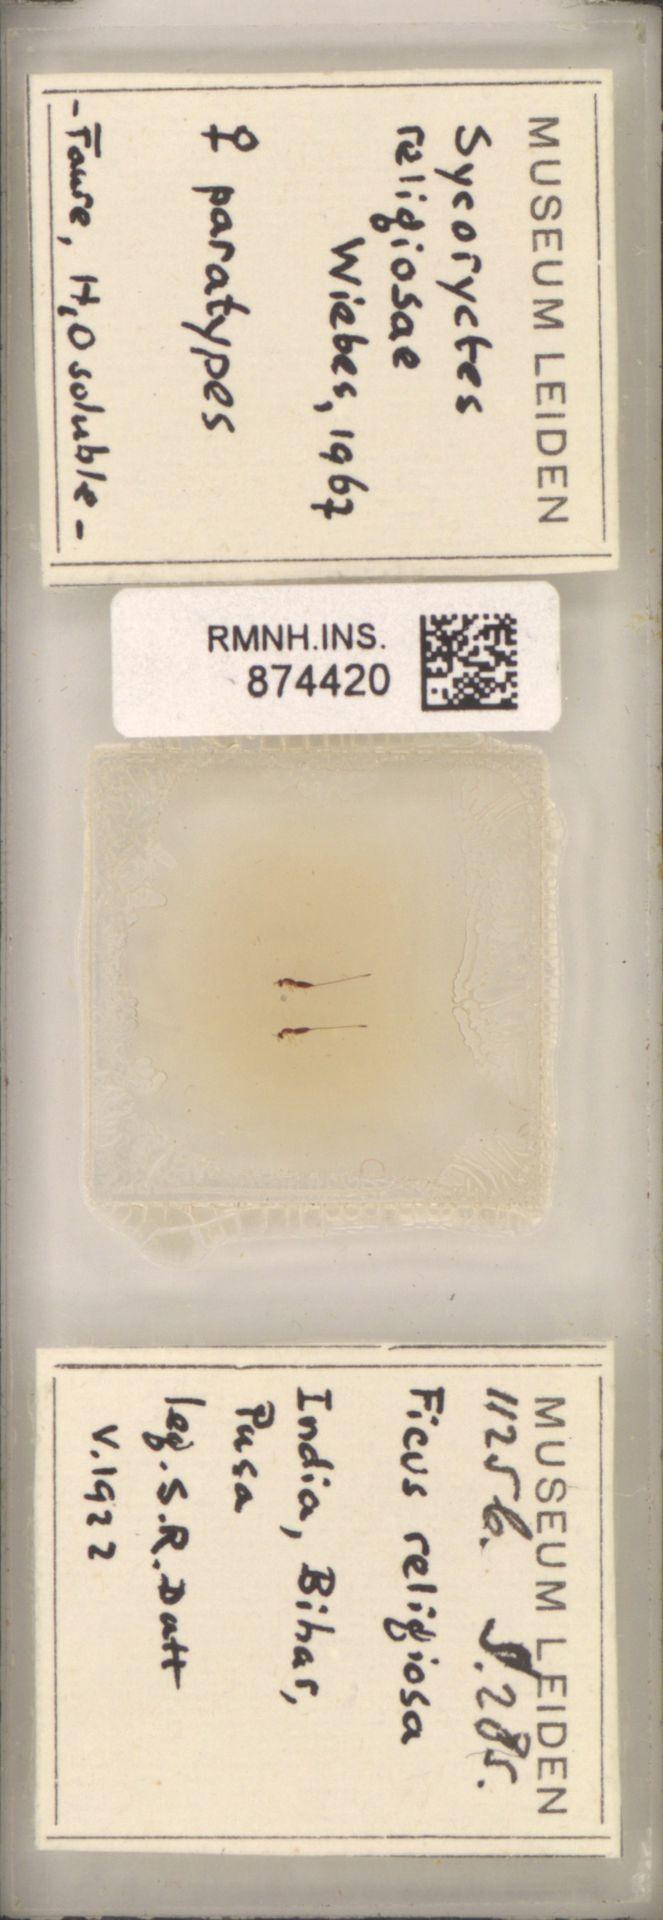 RMNH.INS.874420 | Sycoryctes religiosae Wiebes, 1967